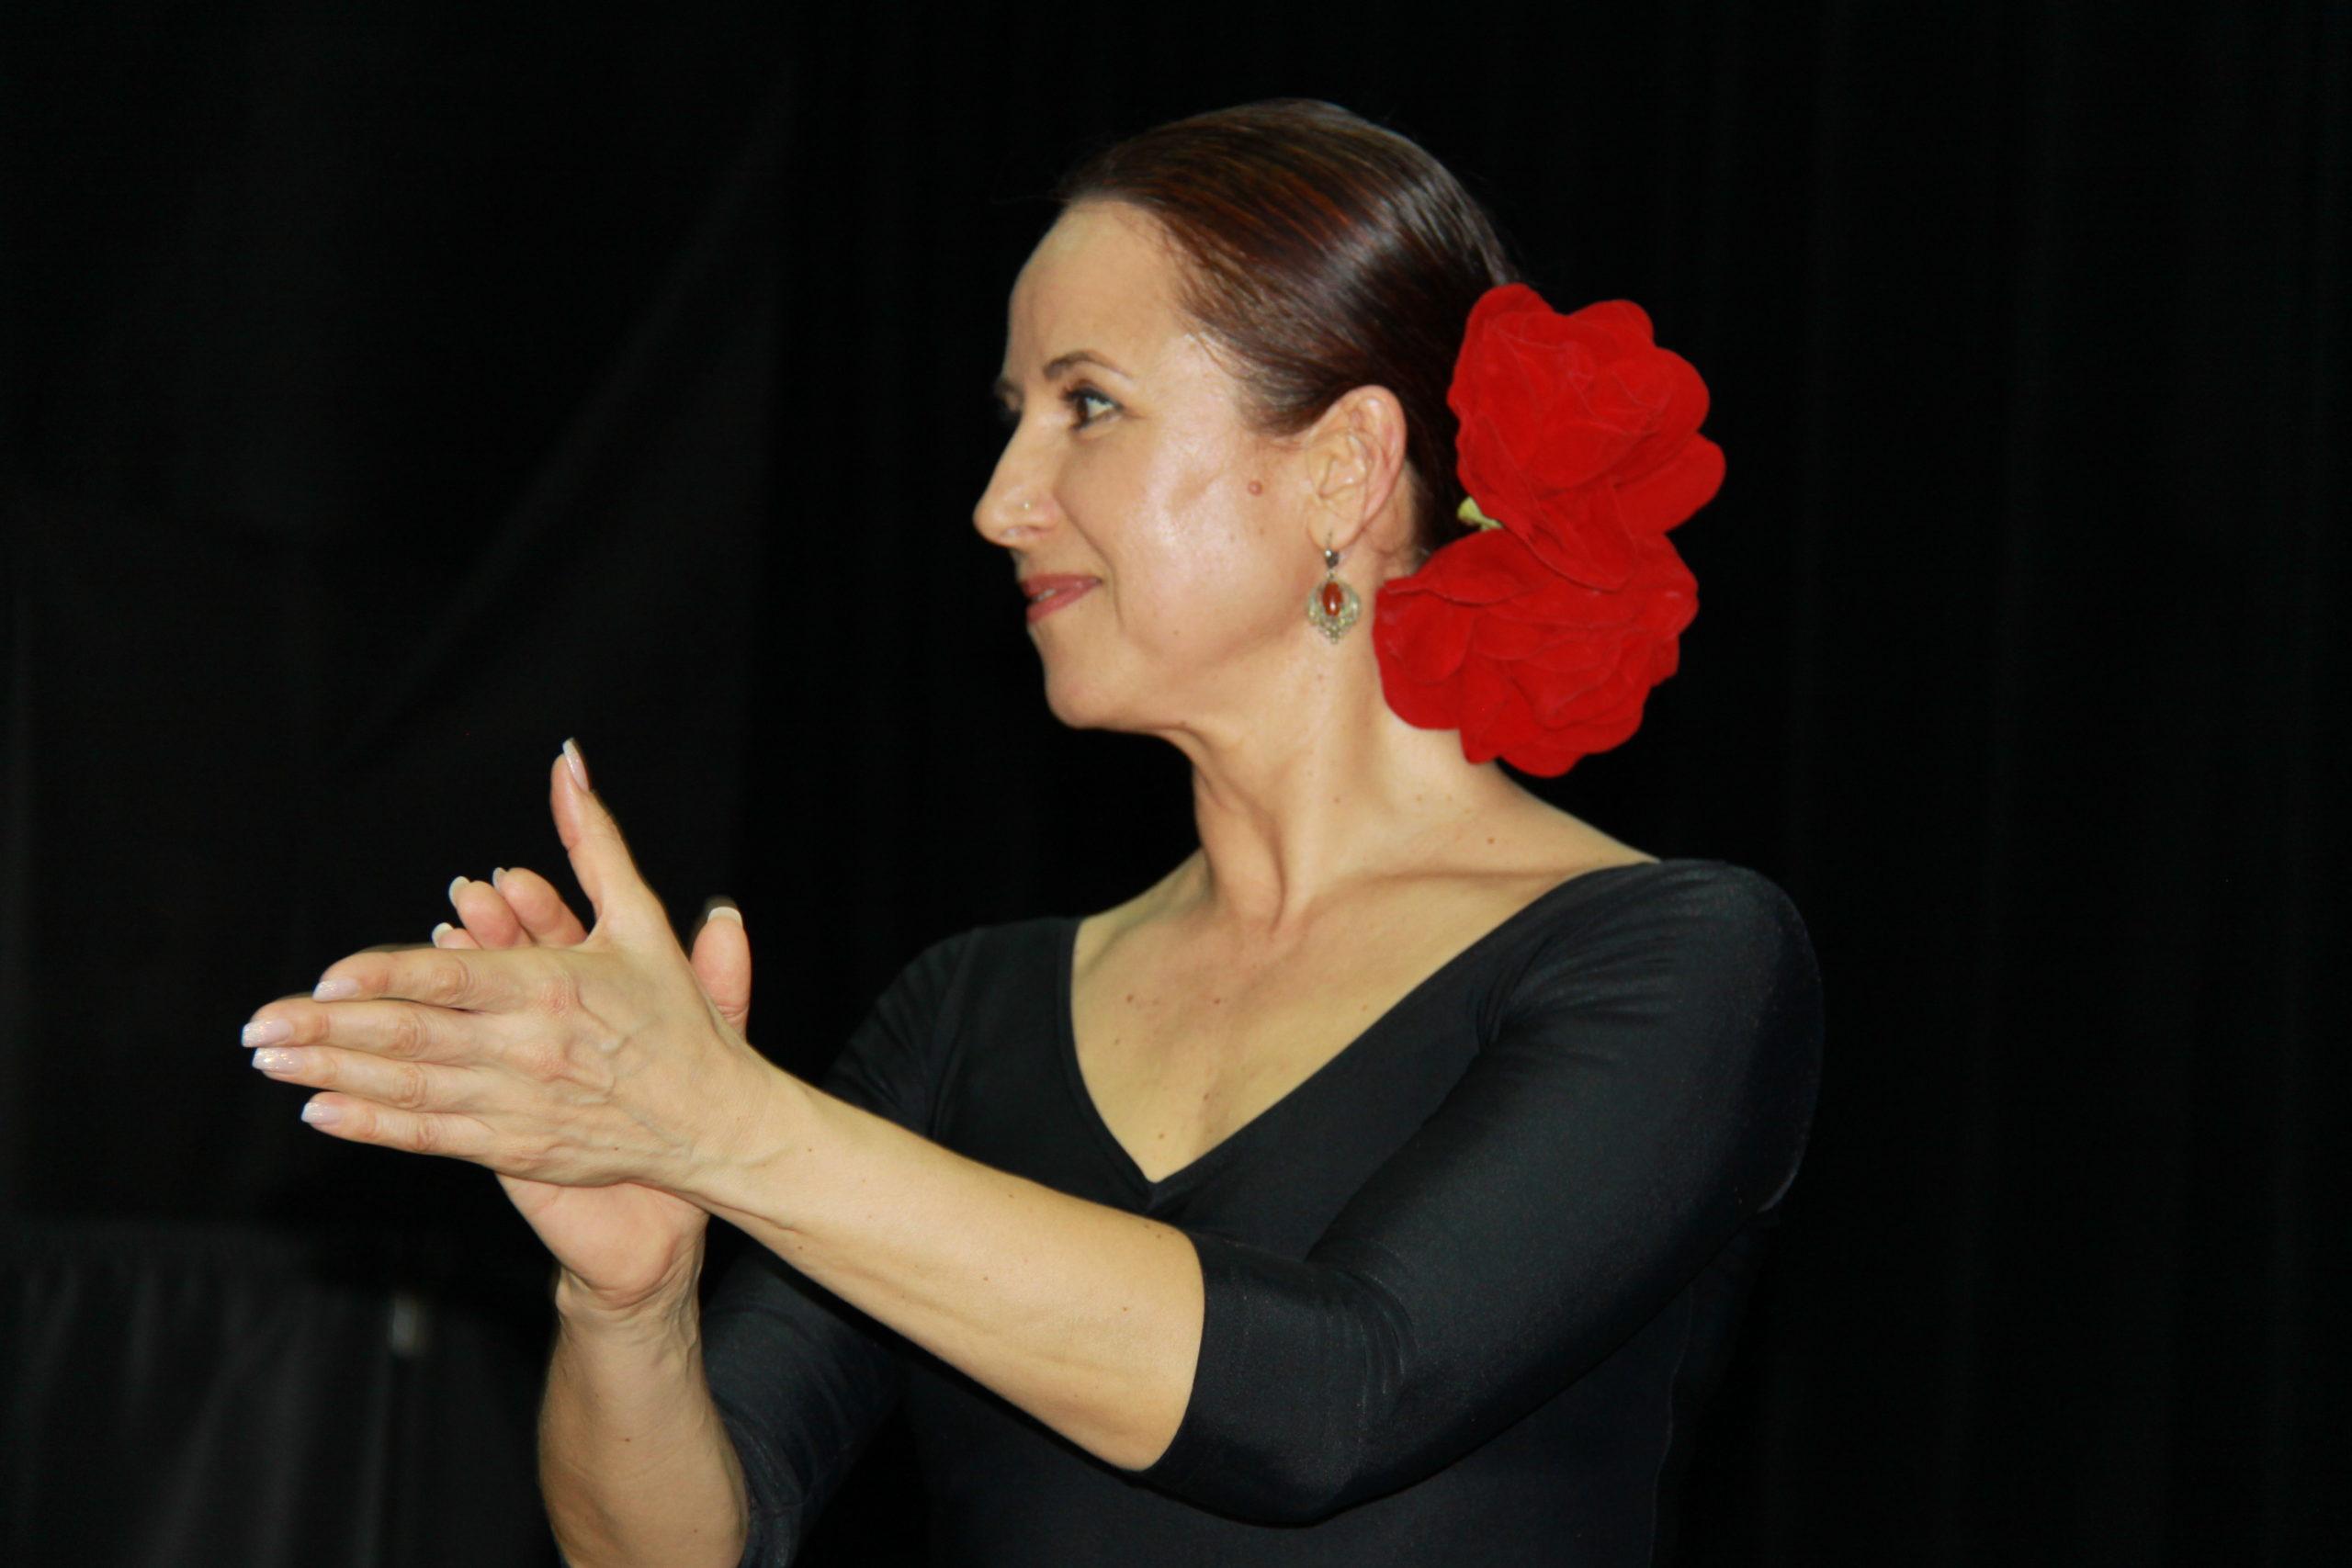 Фламенко вИКИ: мастер-классы хореографа изИспании